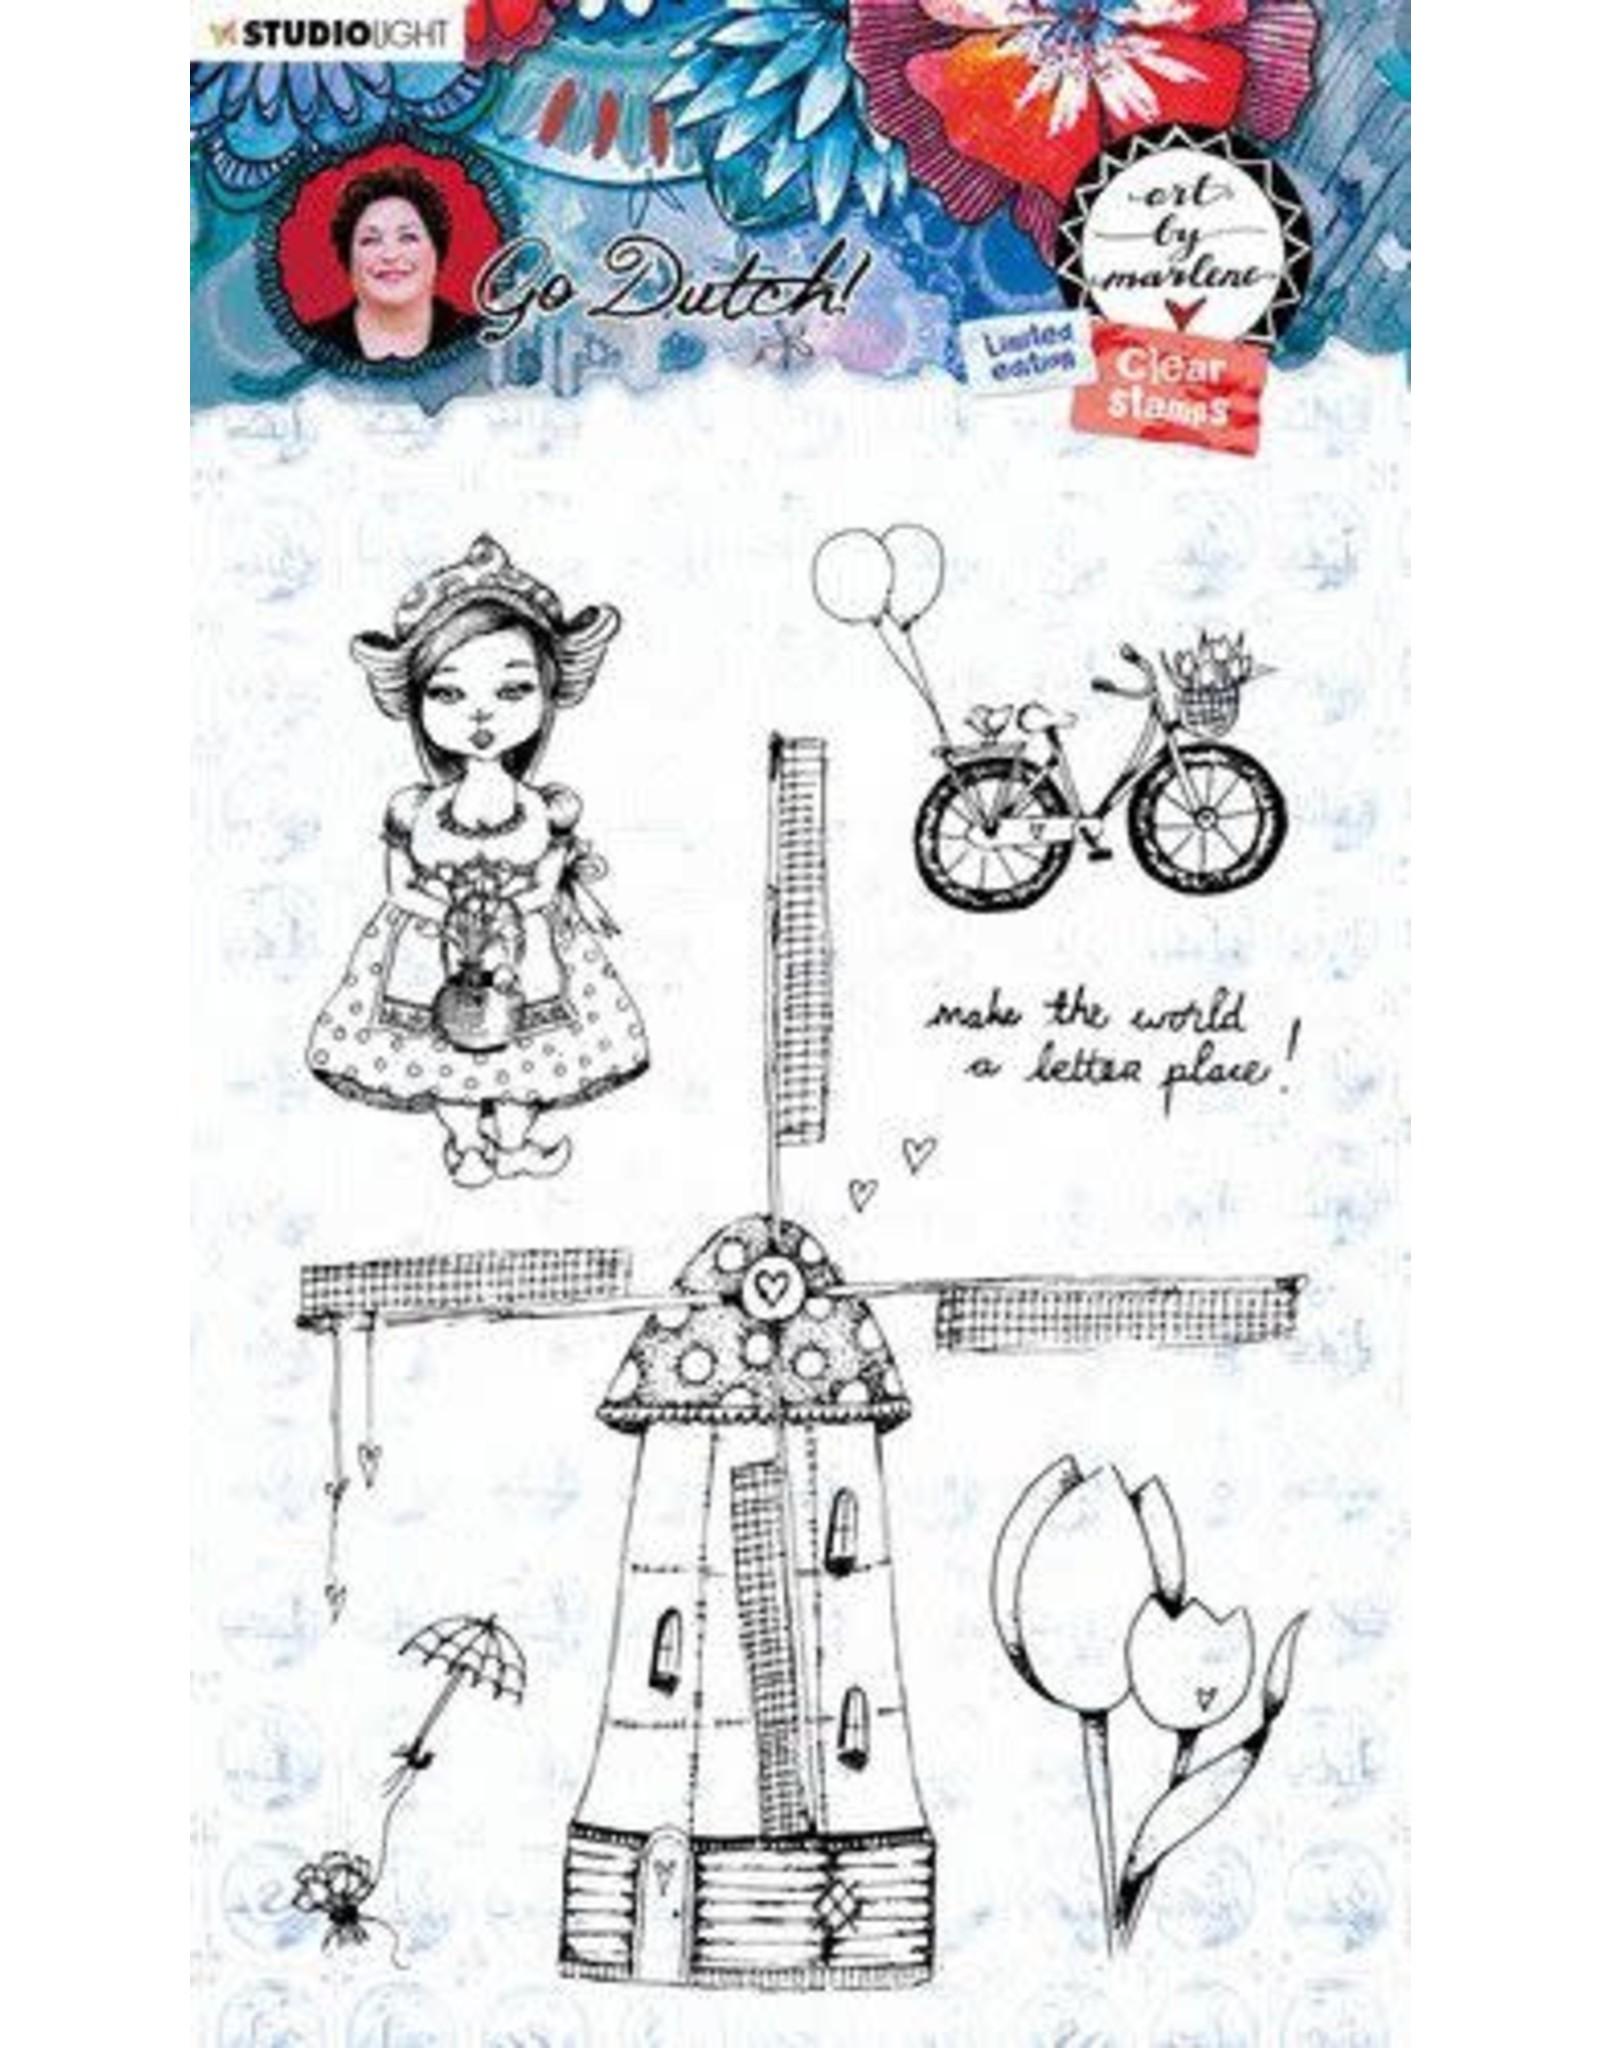 Studio Light Studio Light Clear Stamp A6 Art By Marlene Go Dutch Collection nr.55 STAMPBM55